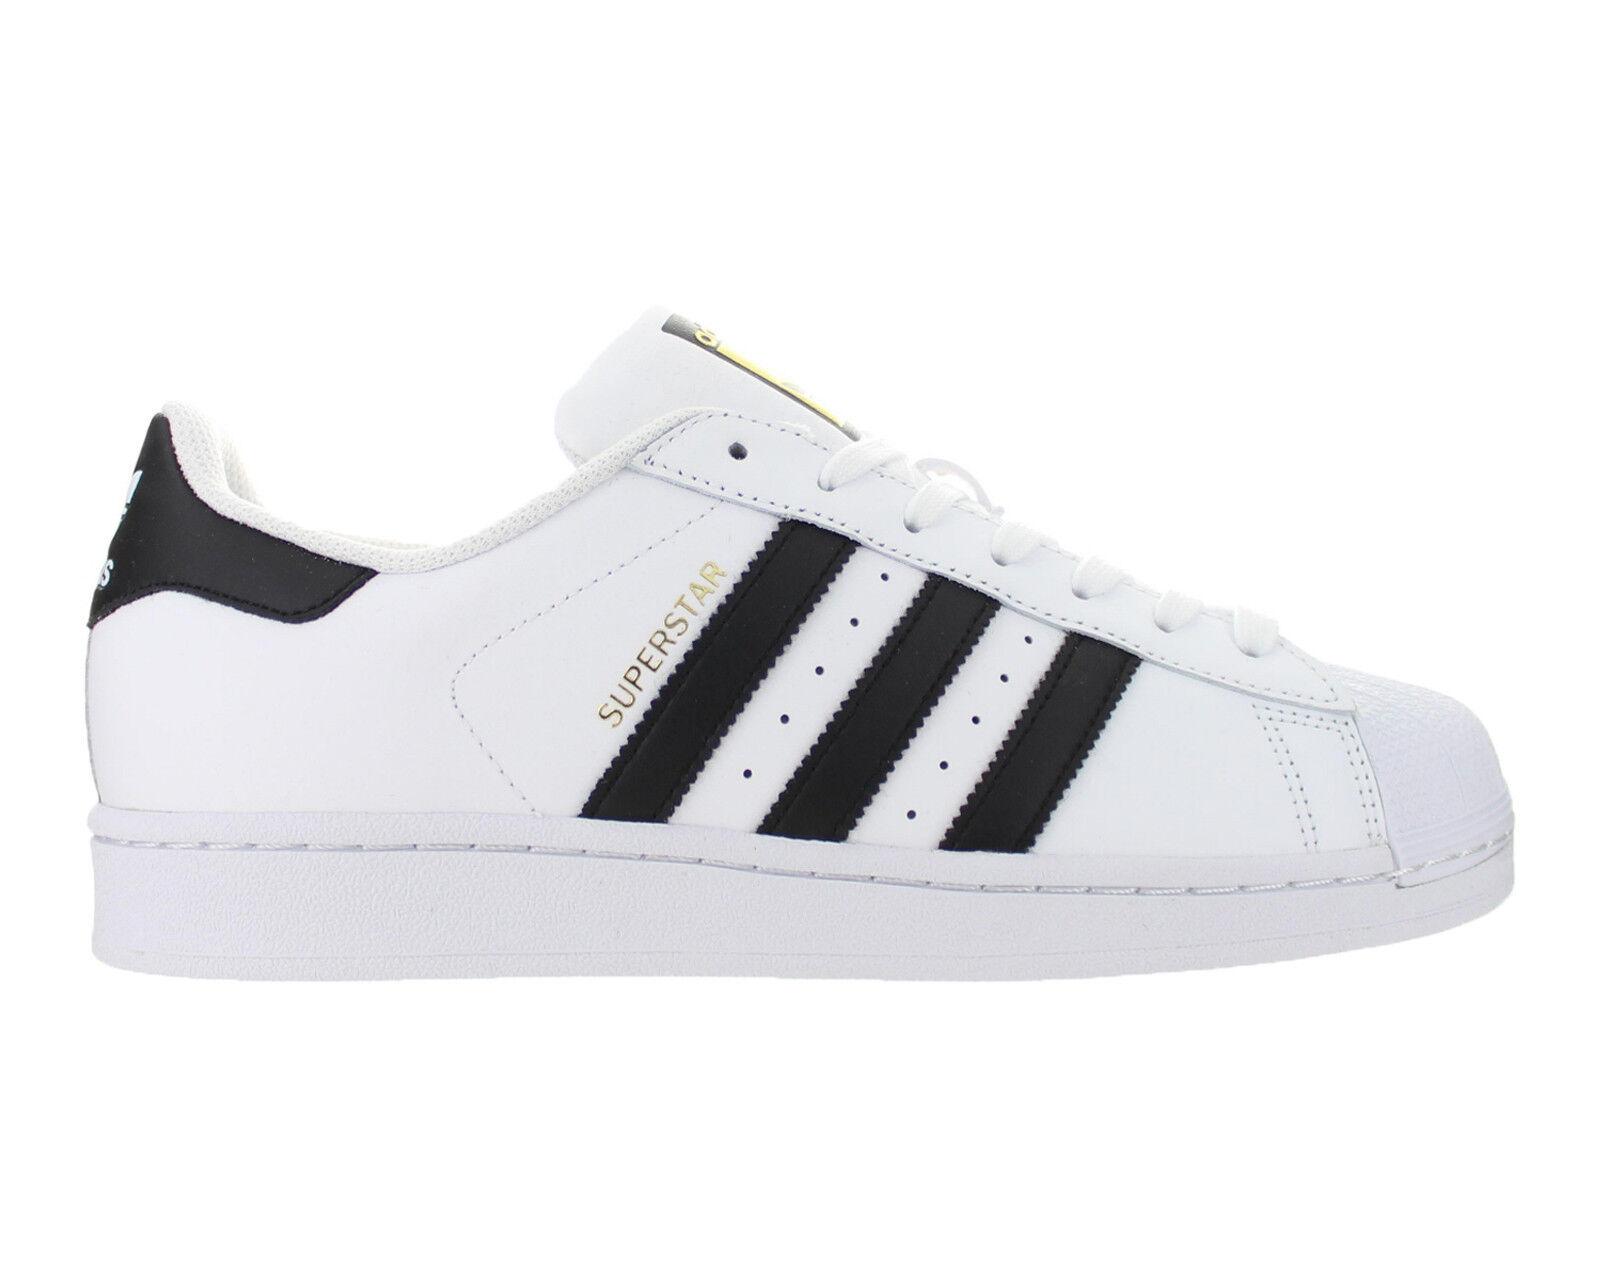 Mens Adidas Adidas Superstar Adidas Mens Originals White Black C77124 9ddb9d